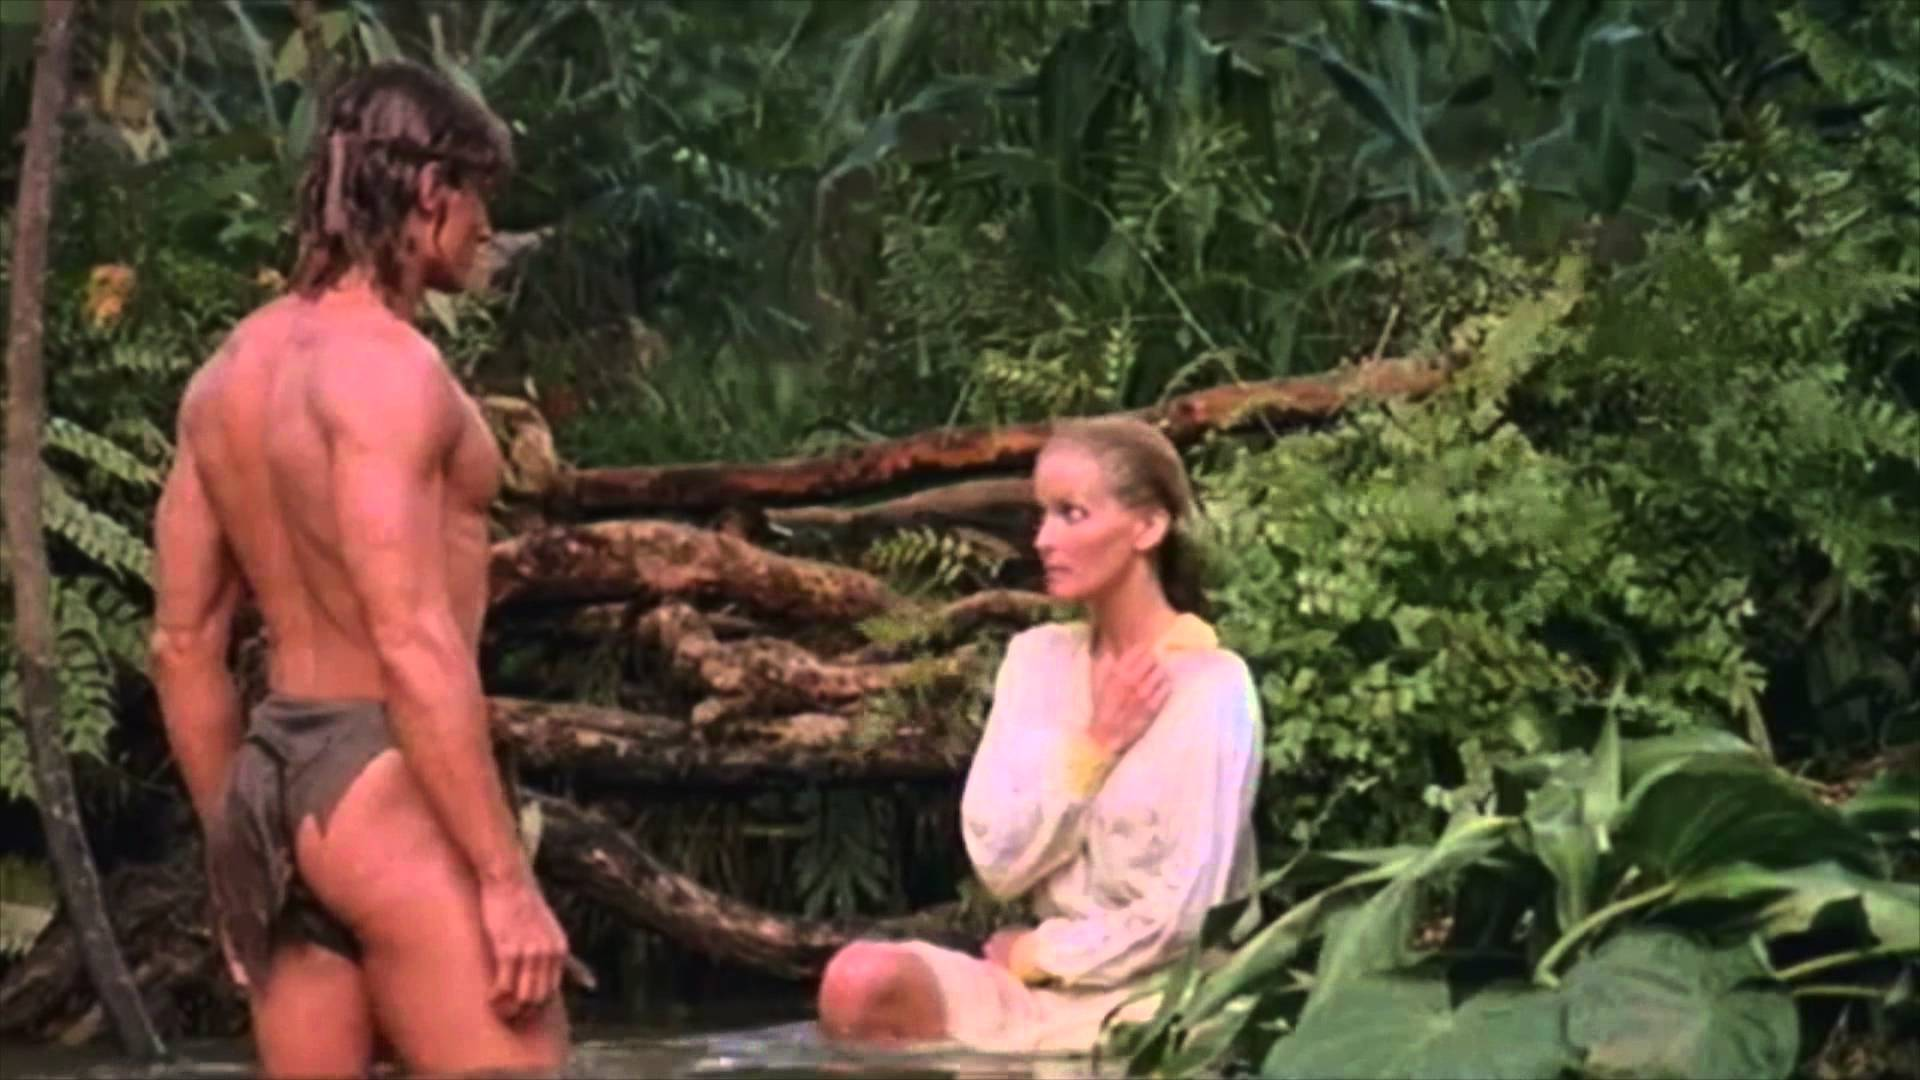 Тарзан членомонстр джунглей порно онлайн 8 фотография